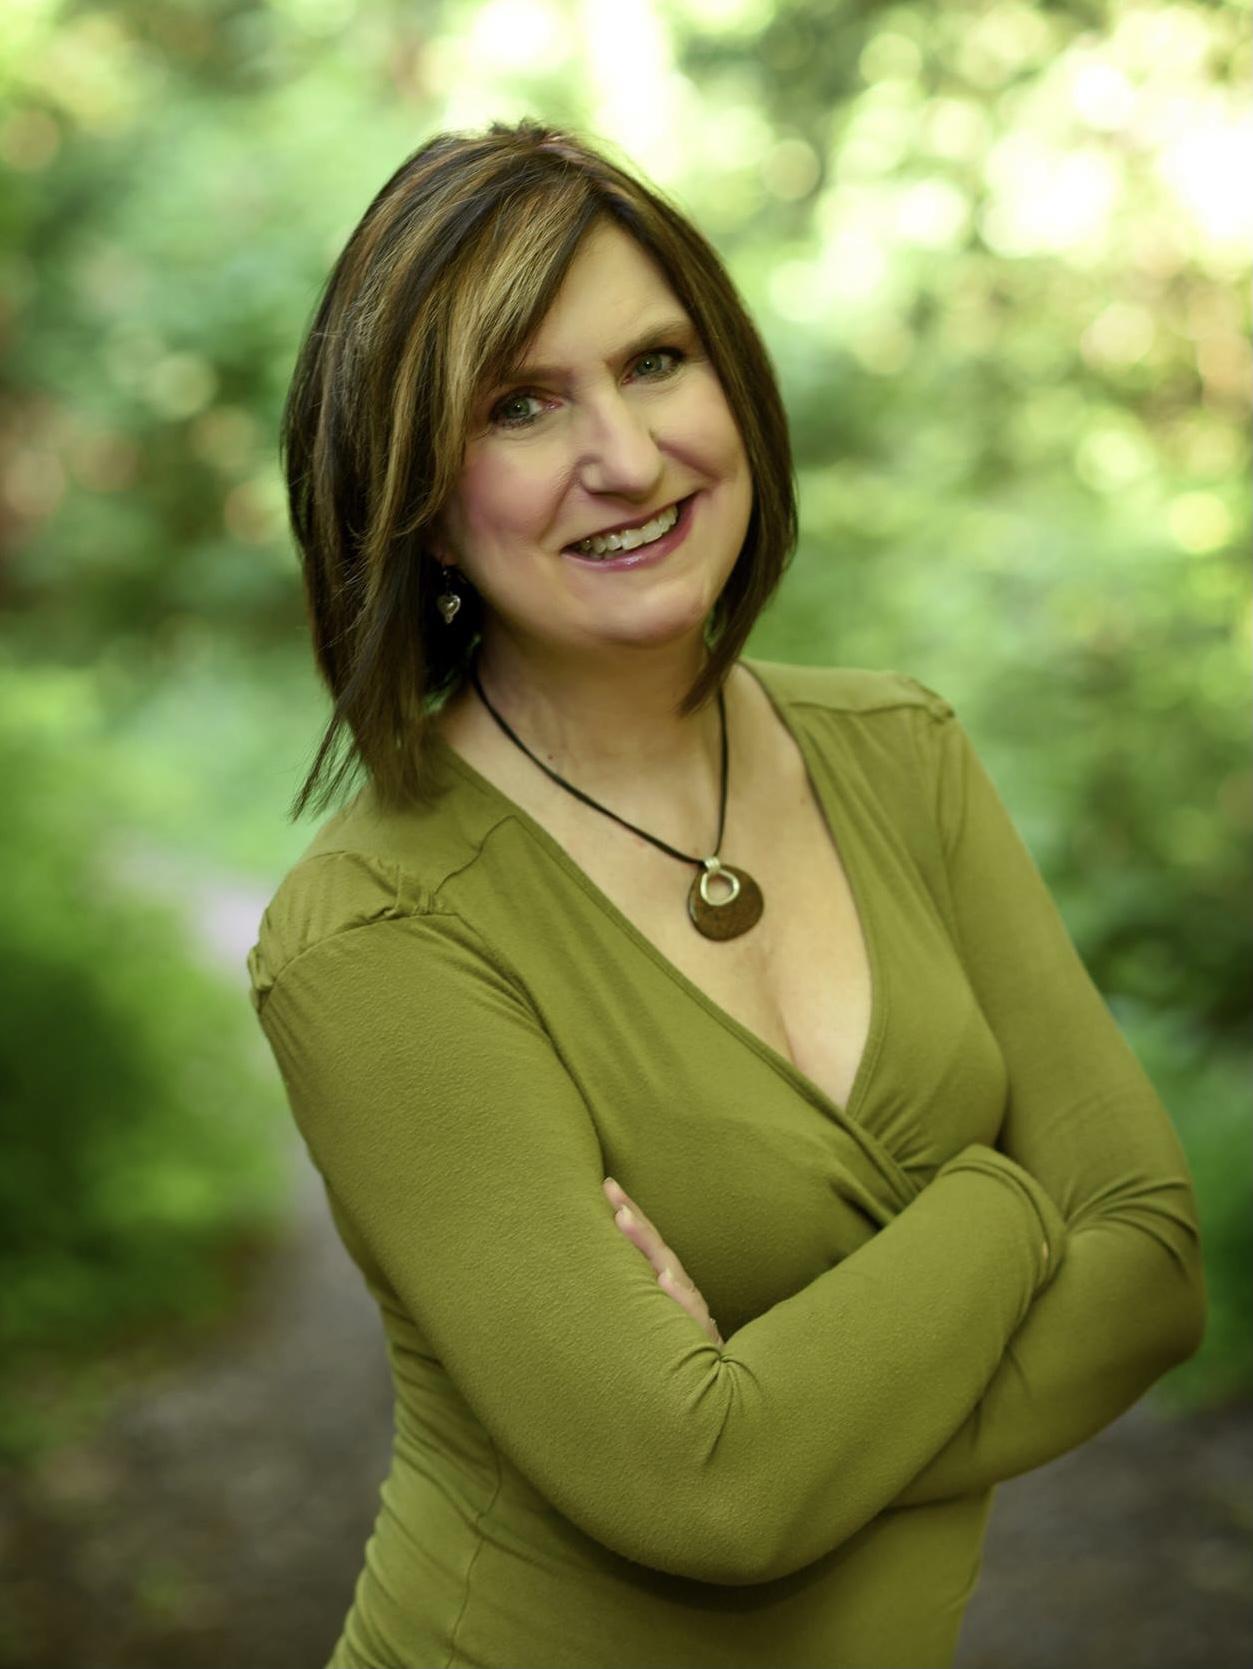 Marla Van Lanen from Wisconsin Sleep Society